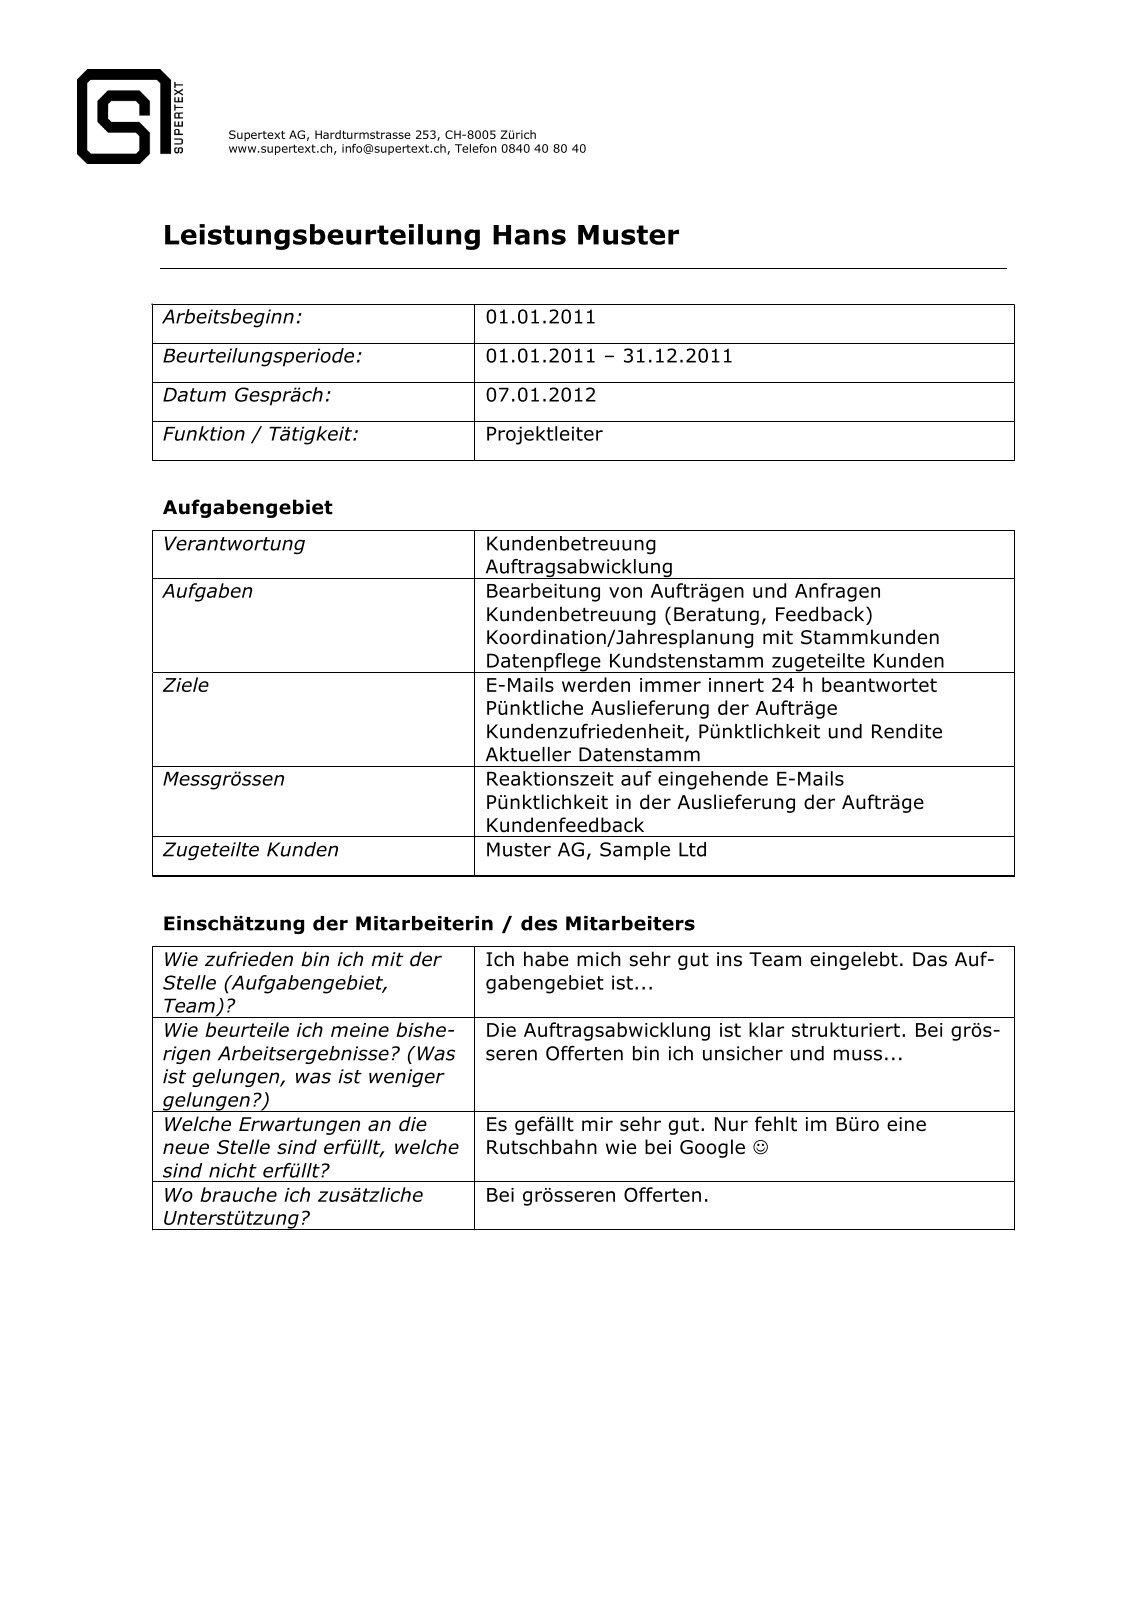 Nett Firmenprofil Vorlagen Wort Bilder - Entry Level Resume Vorlagen ...